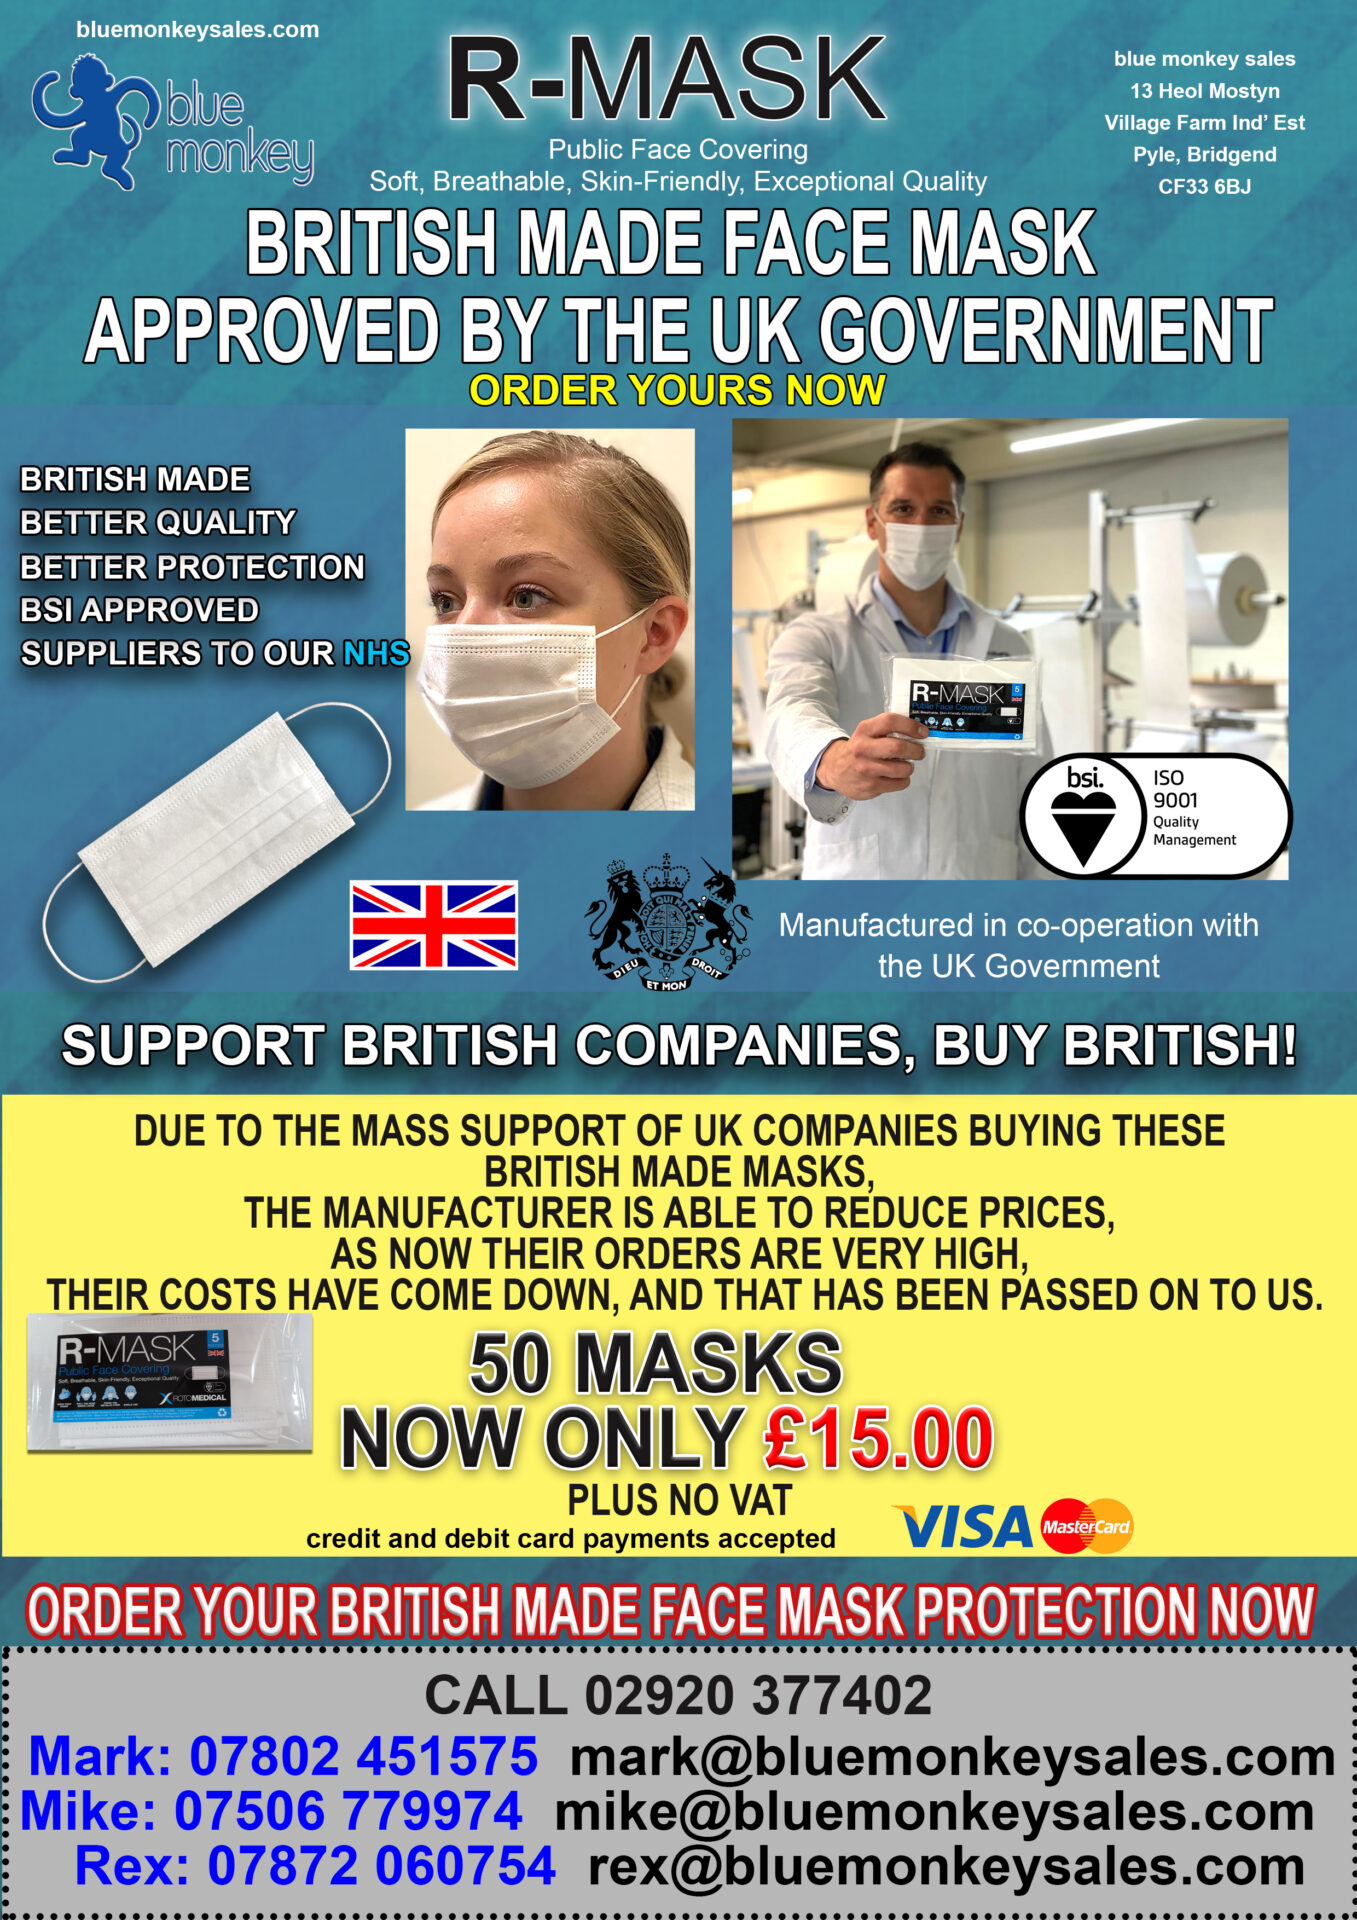 R Mask face mask